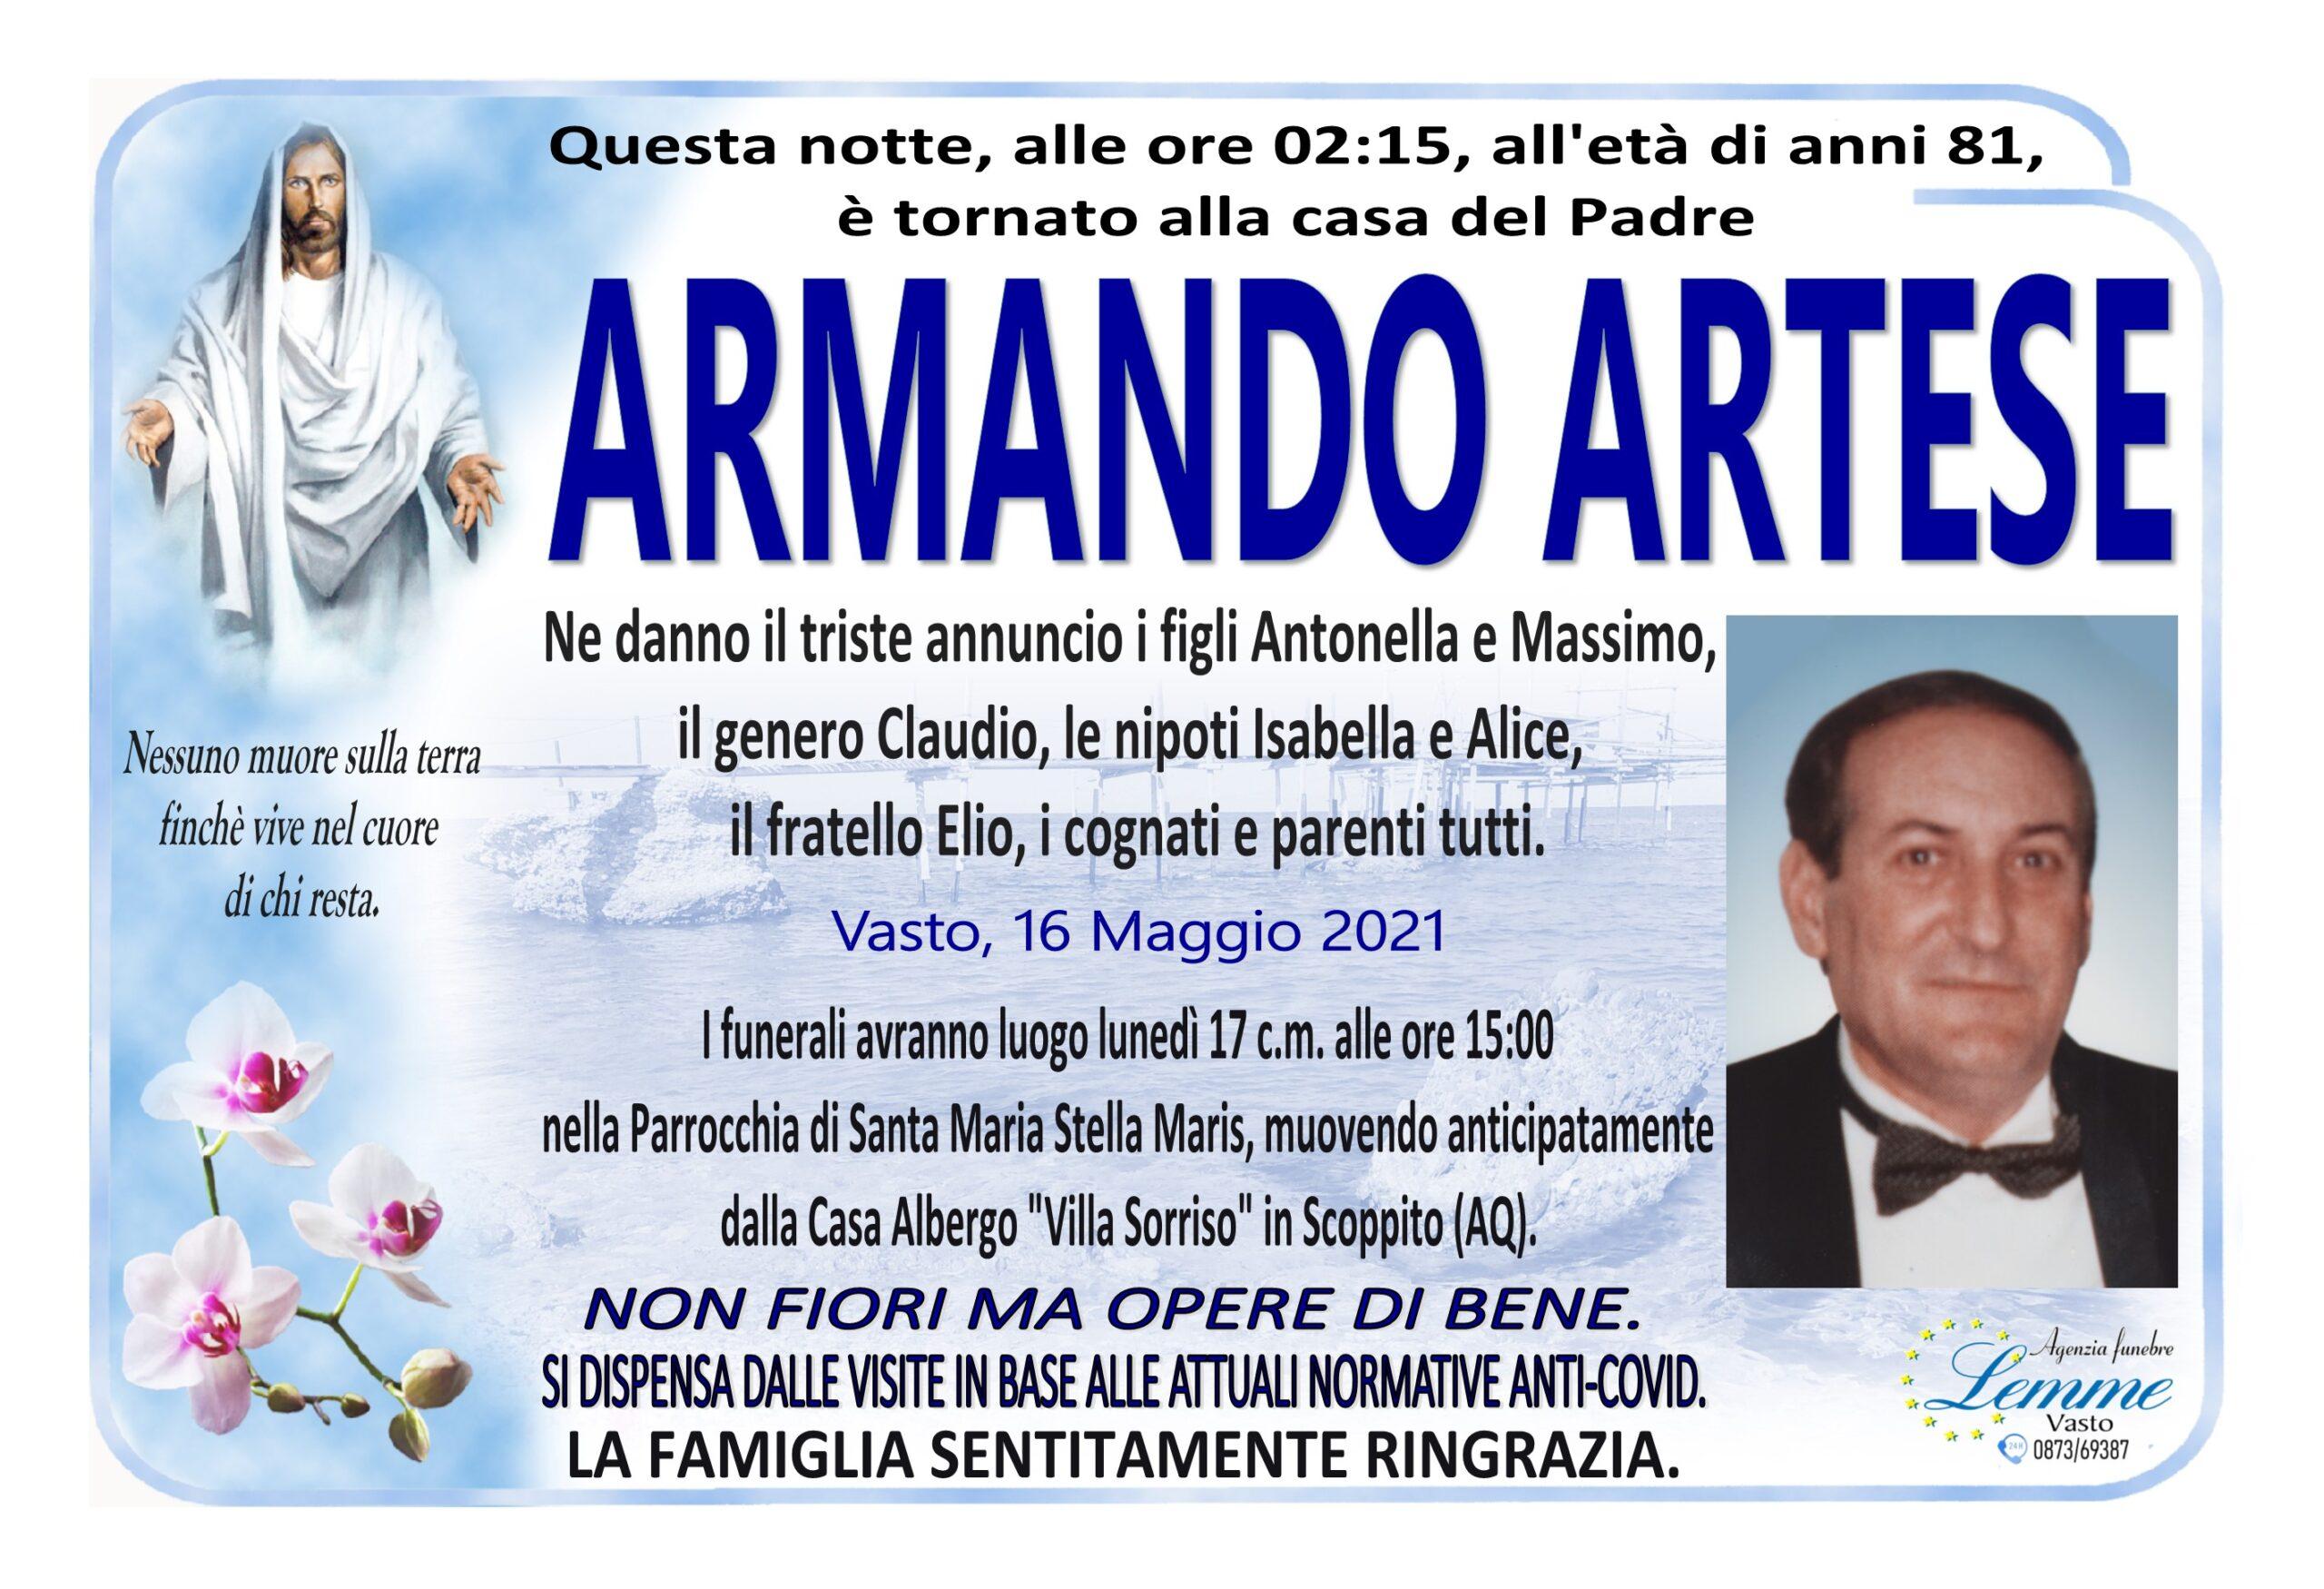 ARMANDO ARTESE